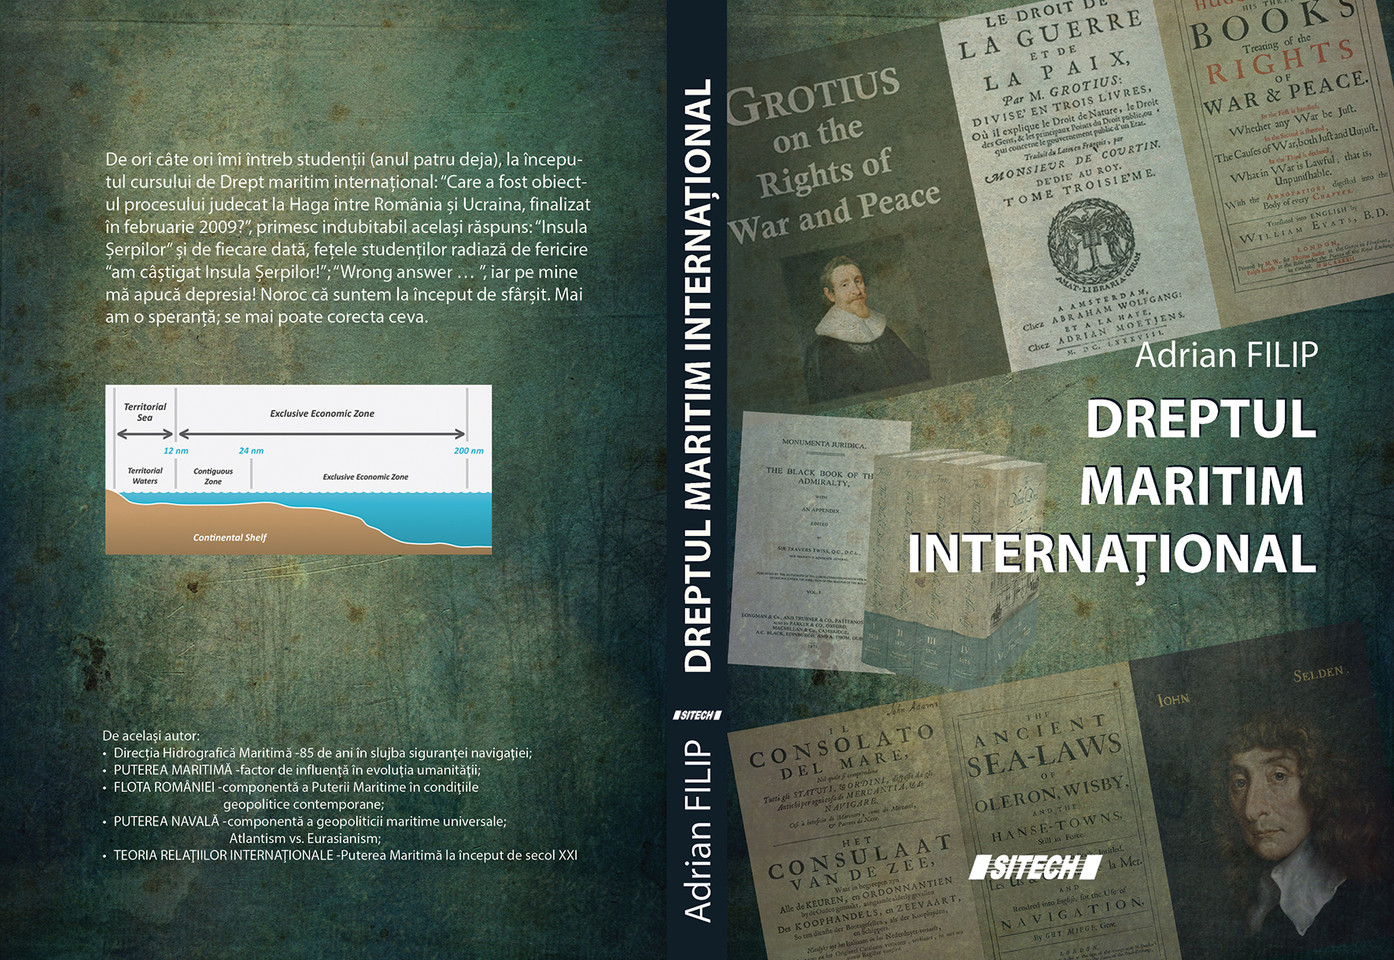 Dreptul maritim internațional